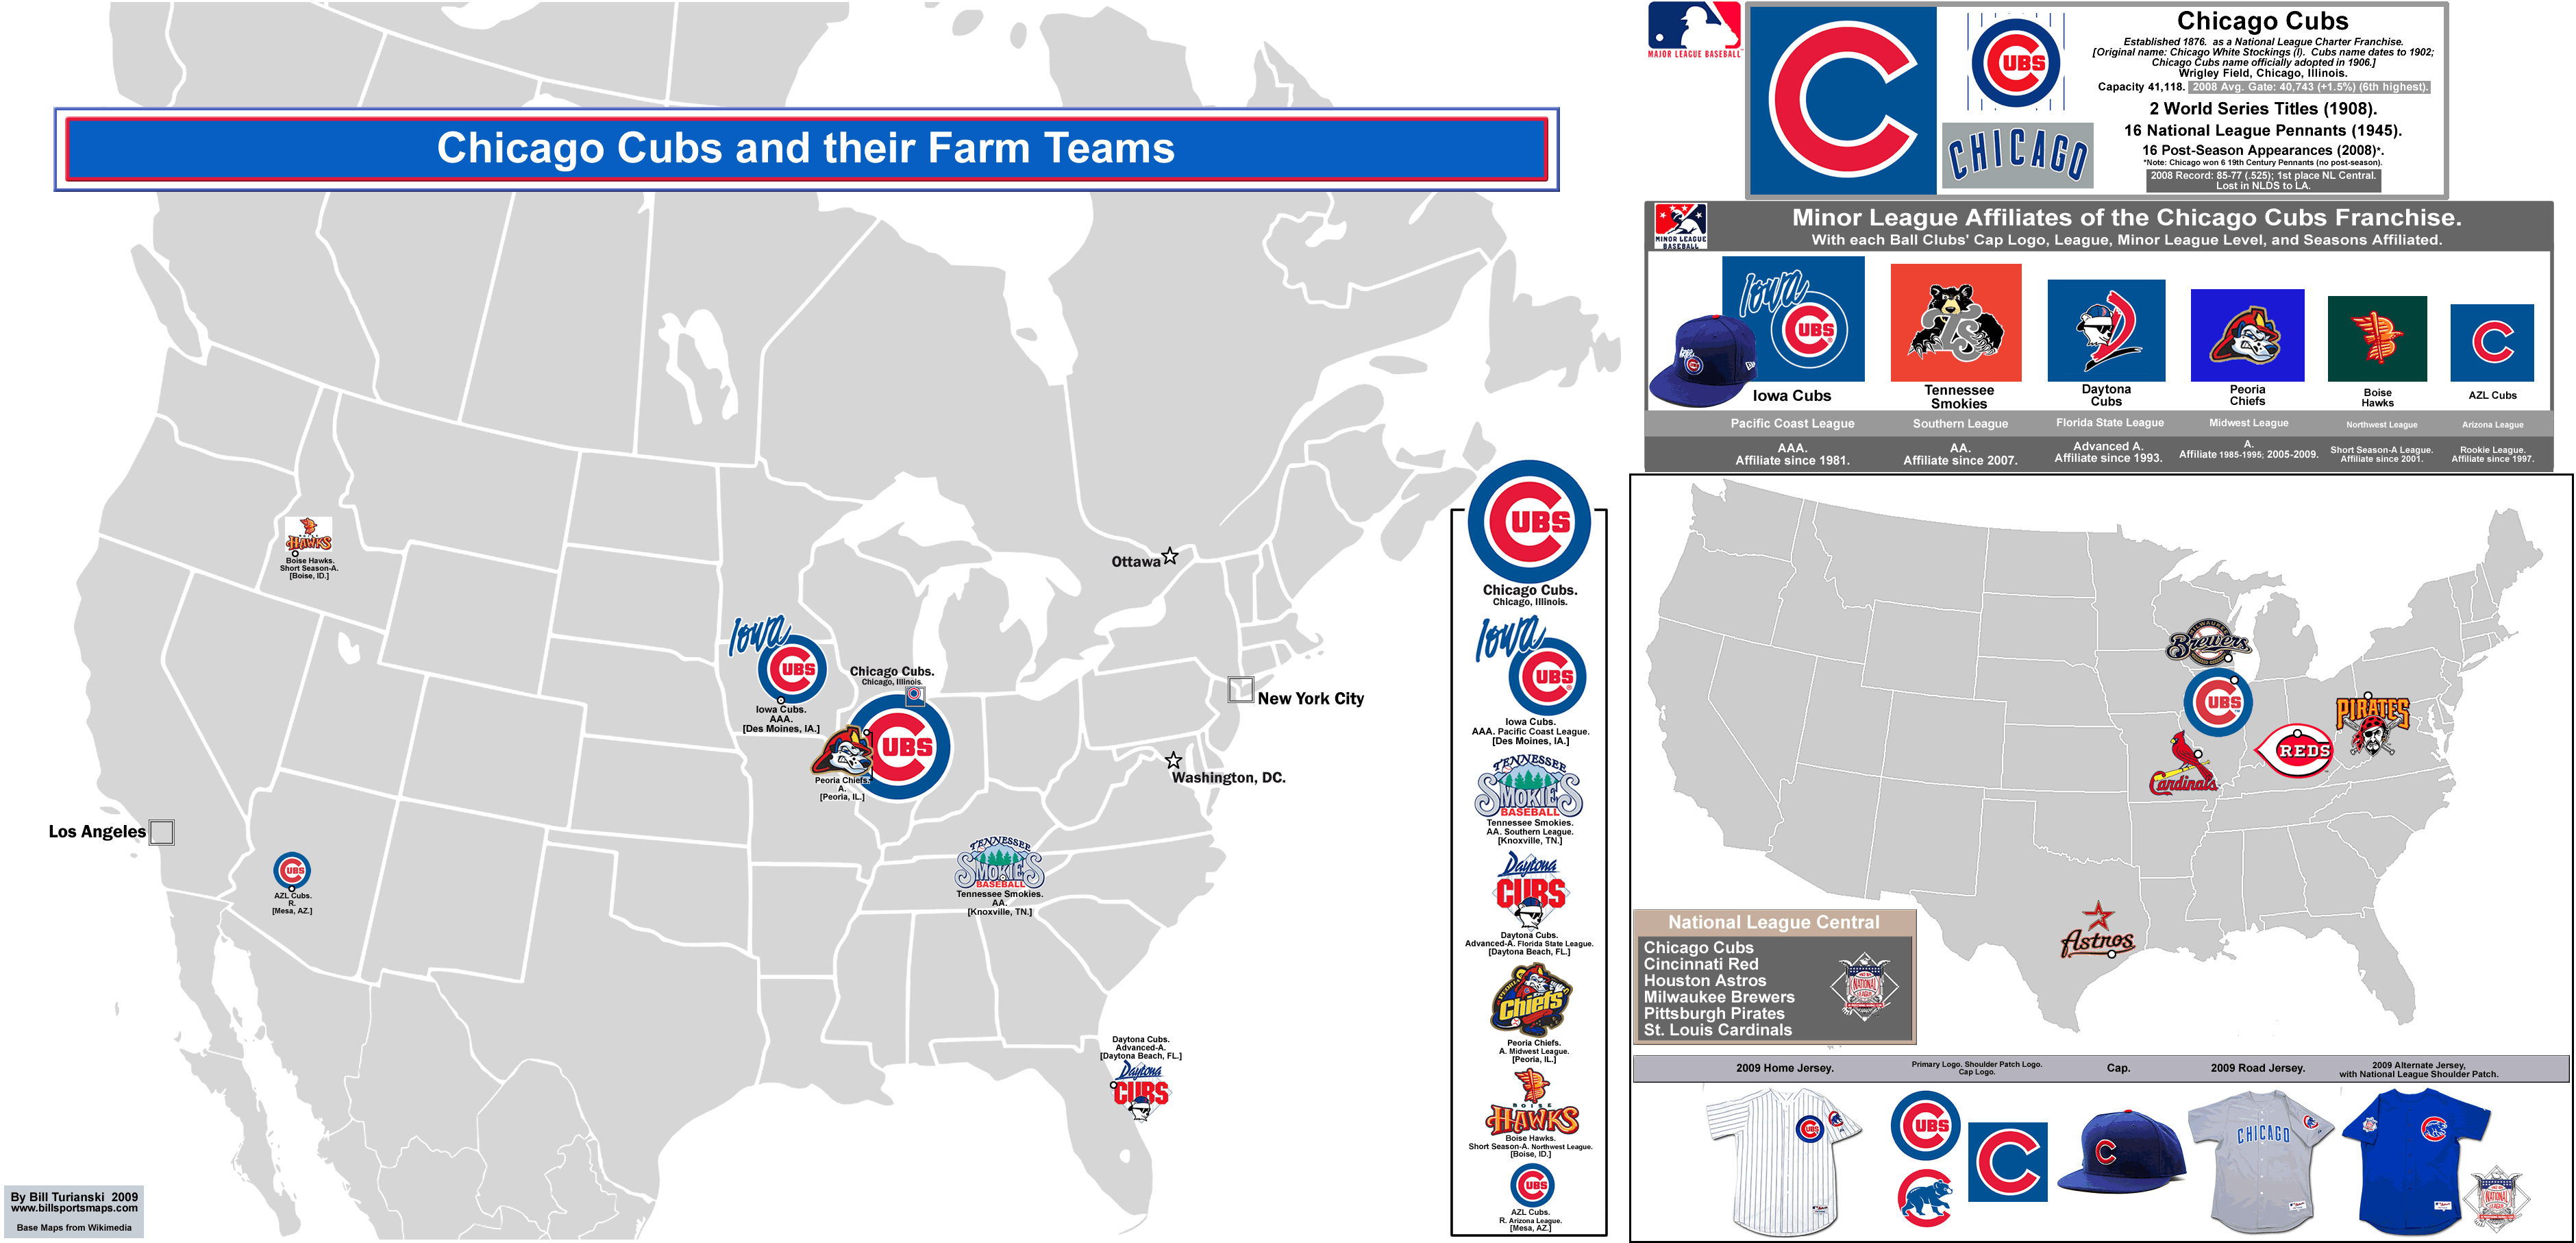 CHICAGO CUBS mlb baseball 3 wallpaper 3760x1814 232507 3760x1814